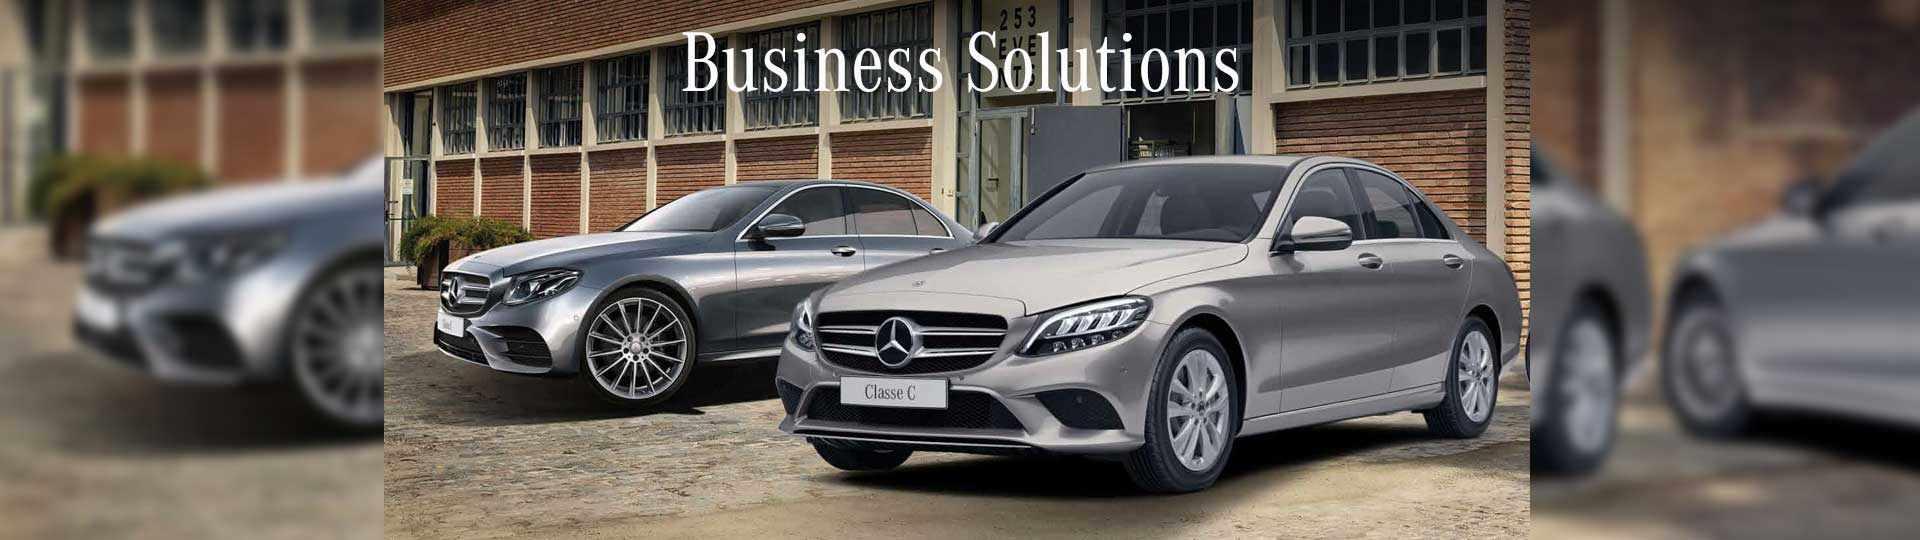 header_mb_business.jpg